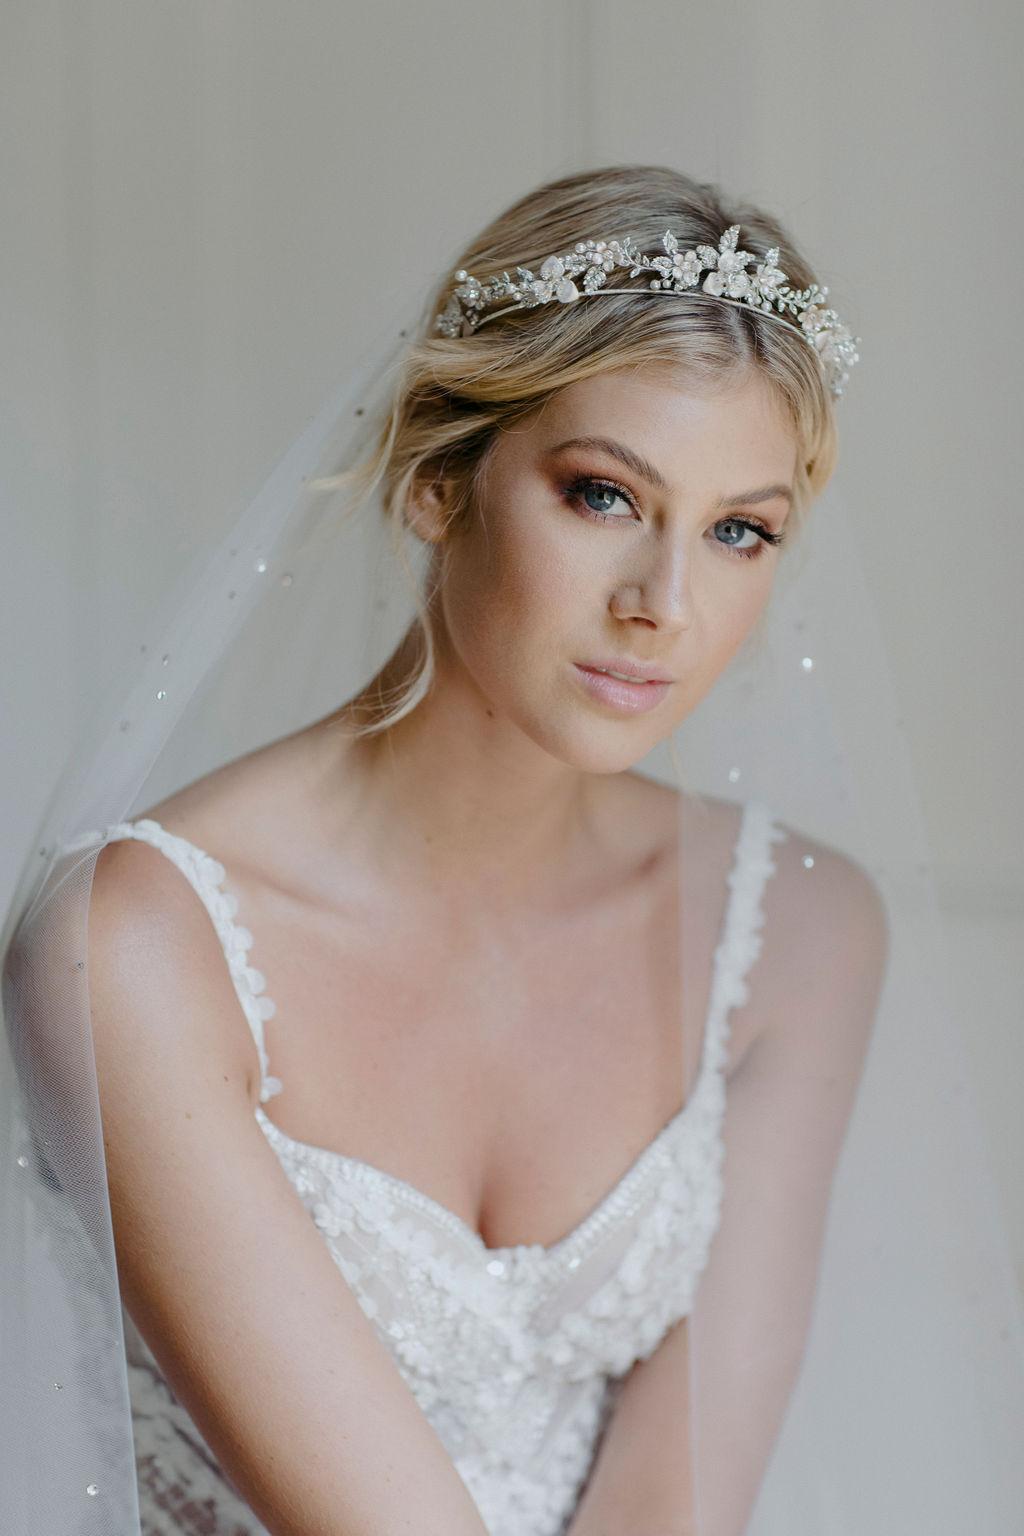 CASHMERE | CRYSTAL WEDDING TIARA by TANIA MARAS